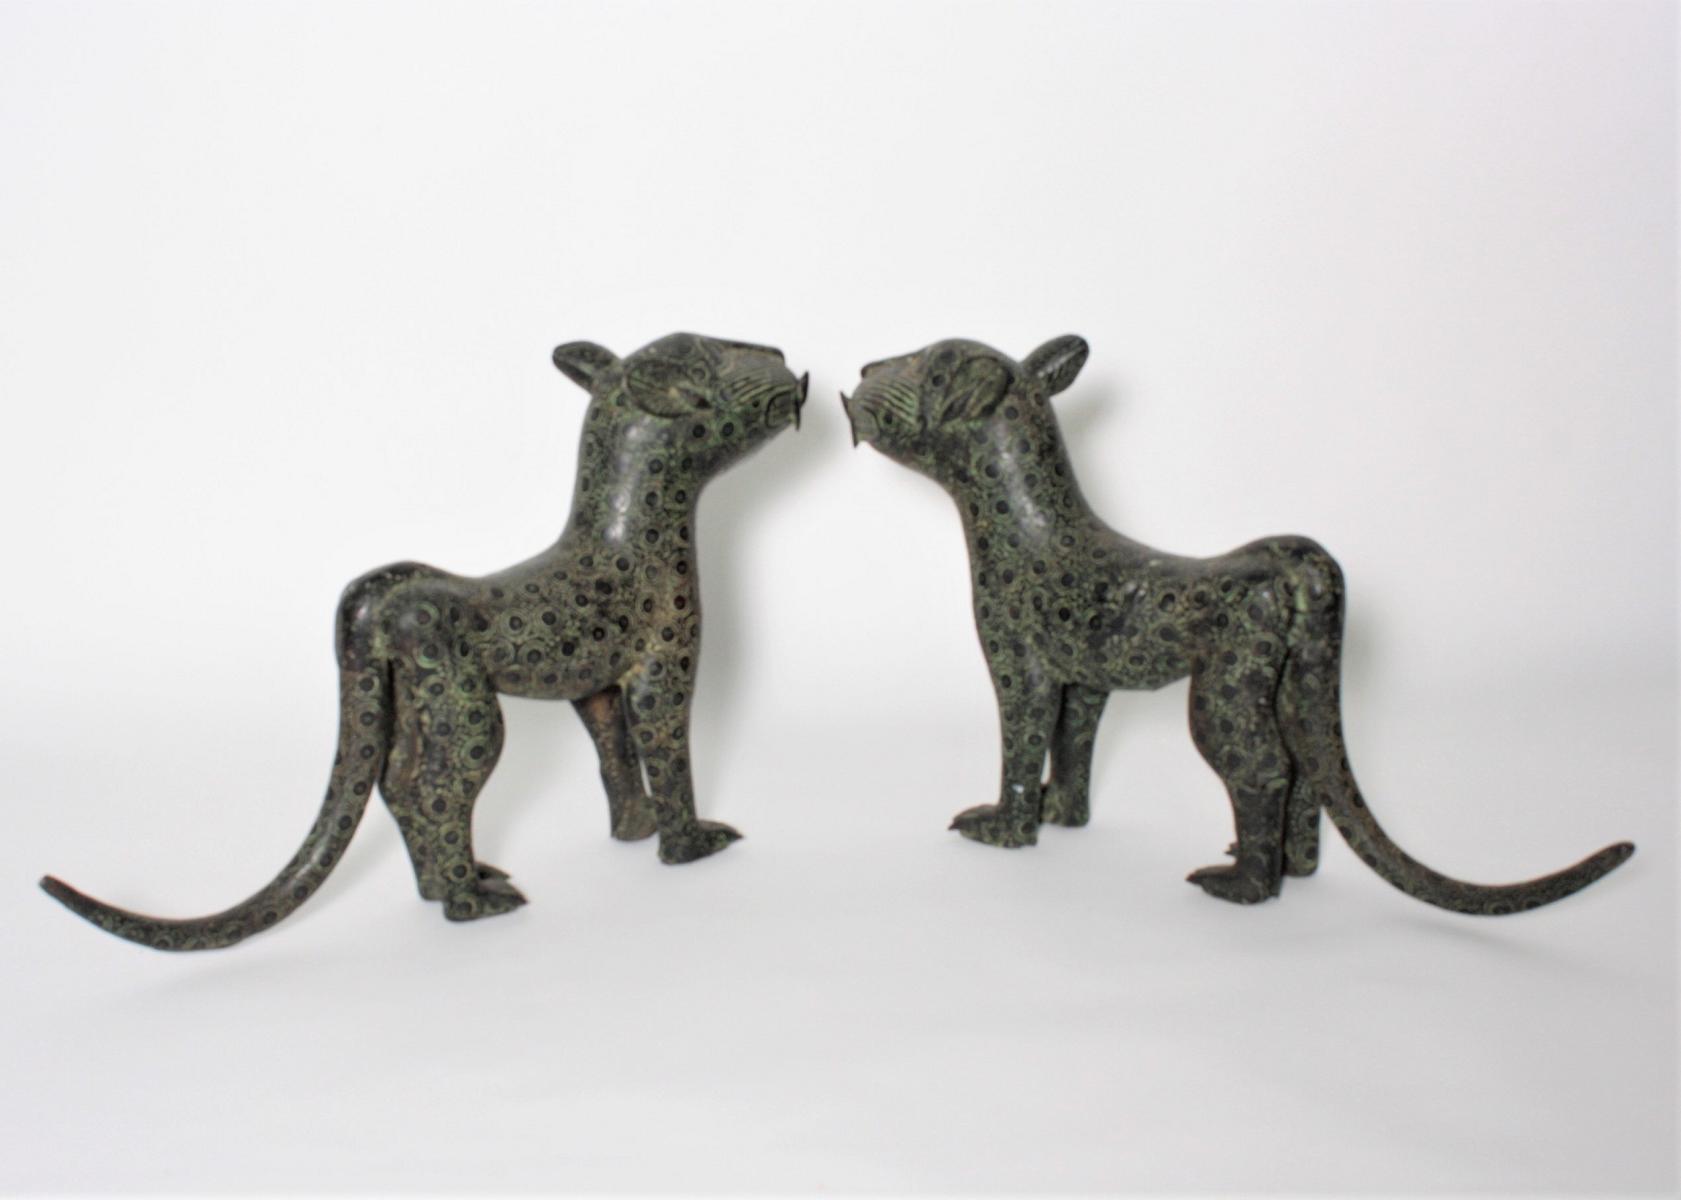 Leoparden Paar, Benin, Nigeria, 1. Hälfte 20. Jh.-2